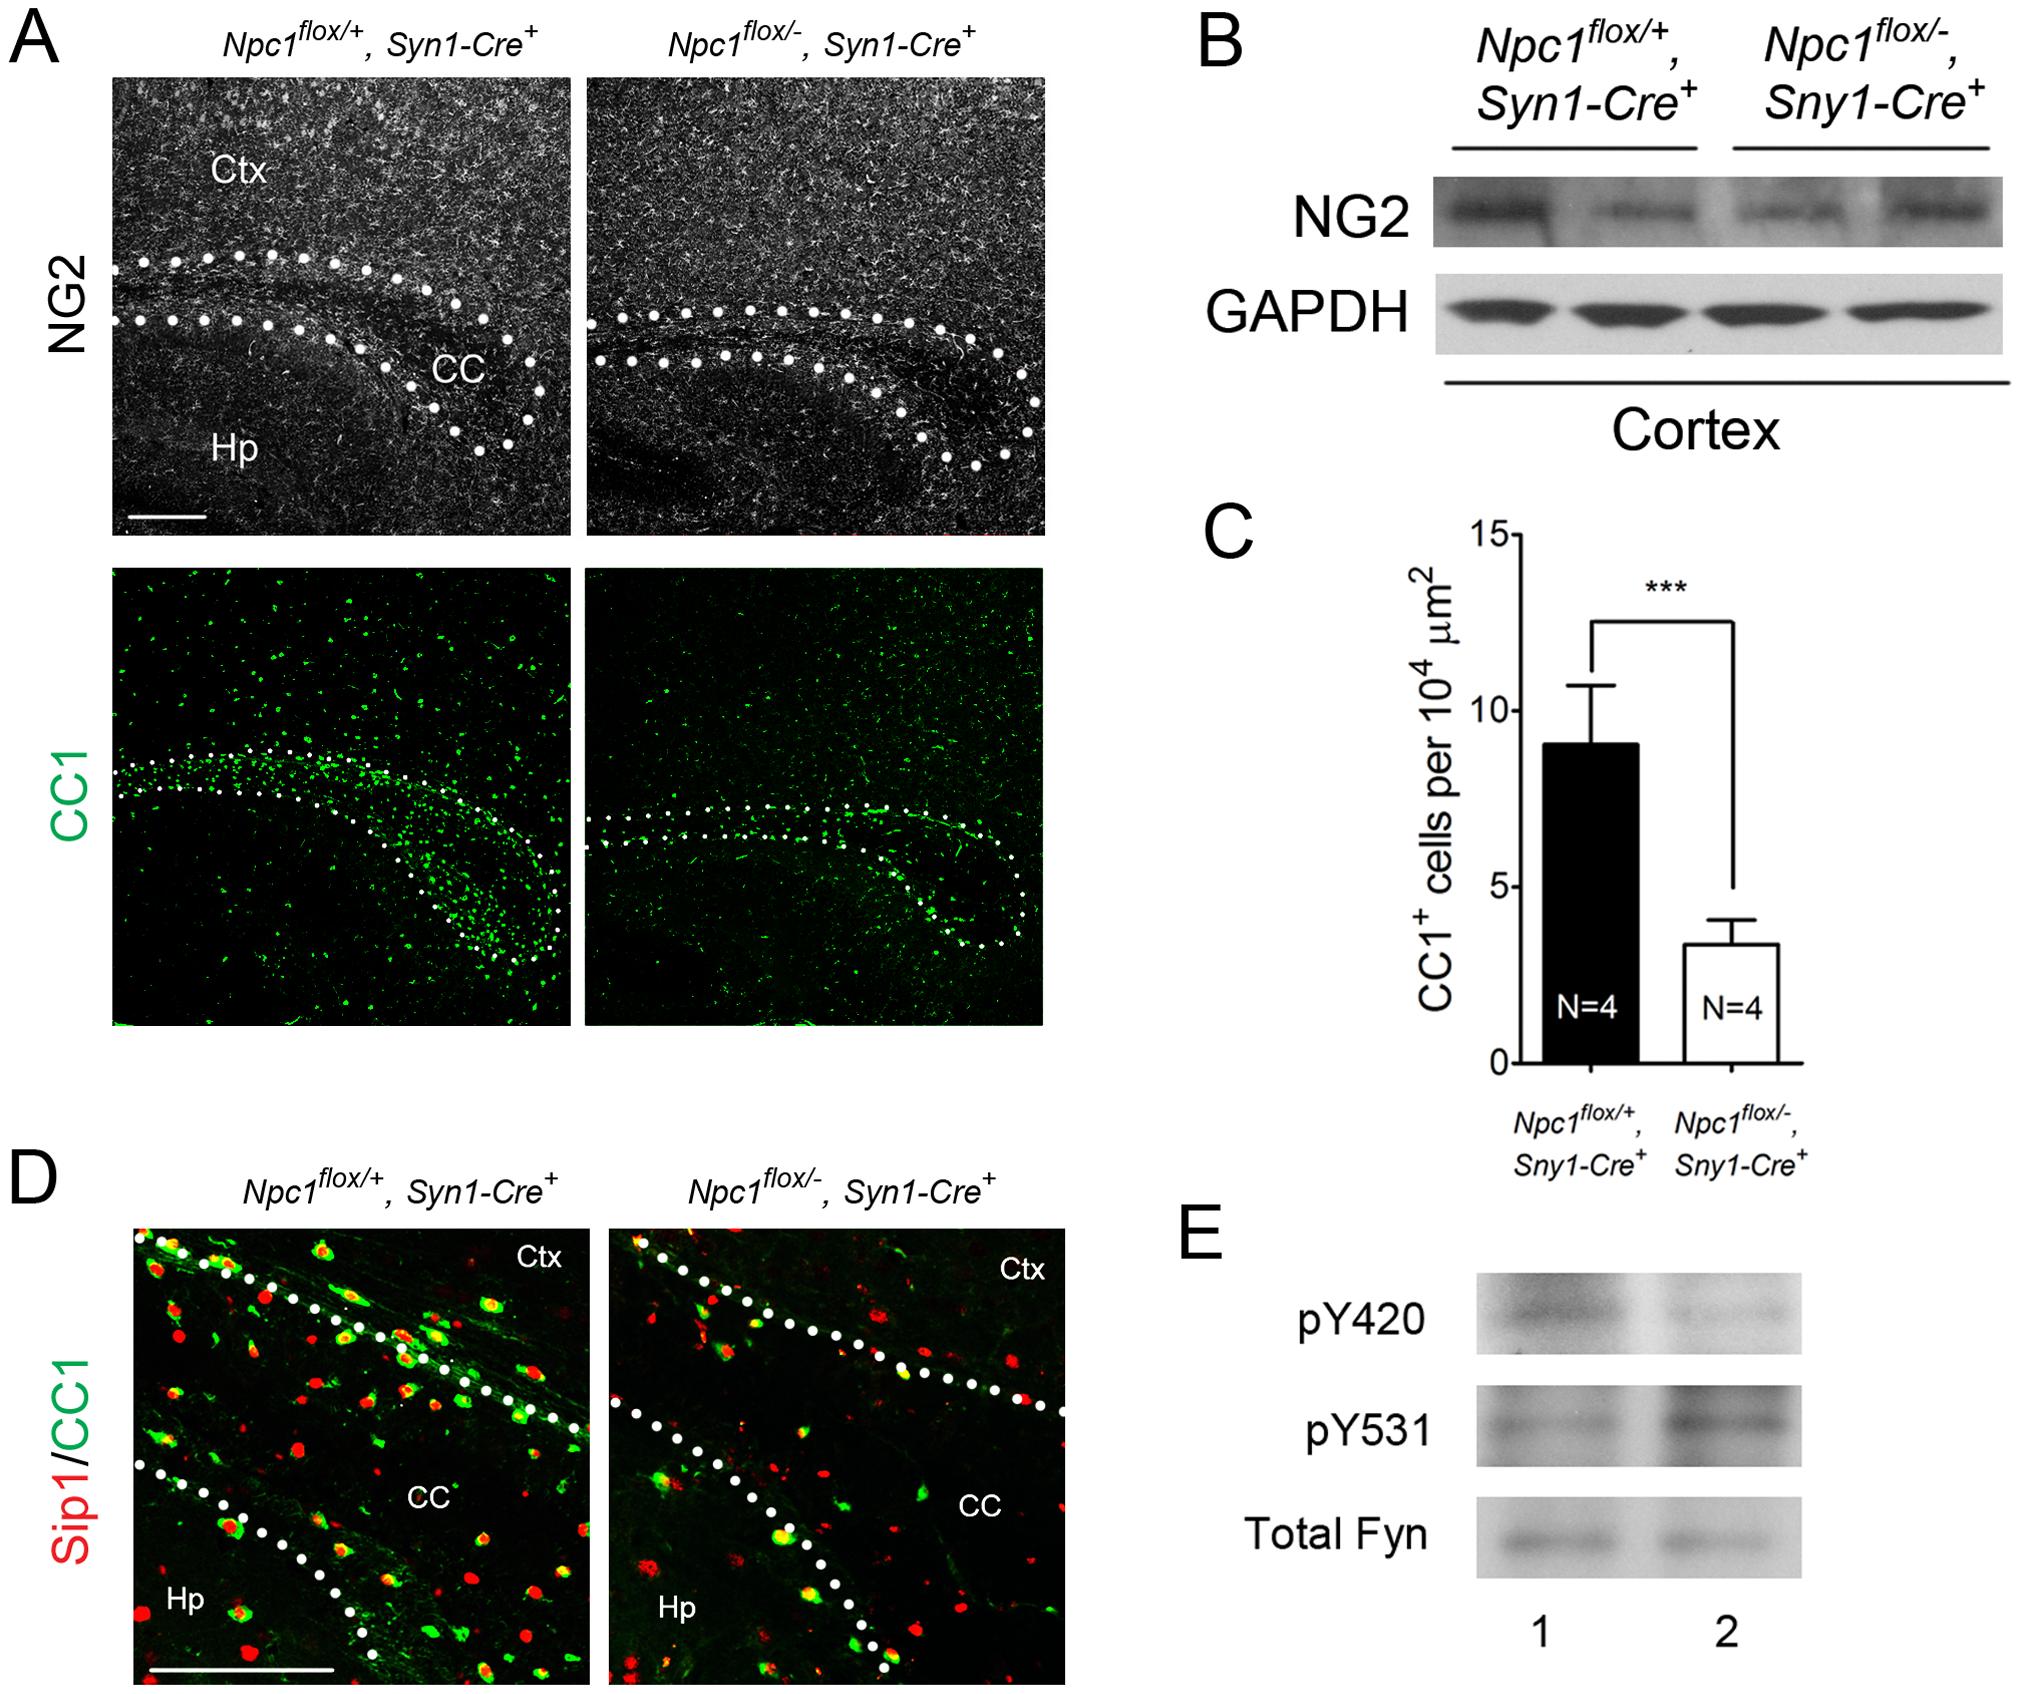 Neuron-specific deletion of <i>Npc1</i> leads to blockade of oligodendrocyte maturation.